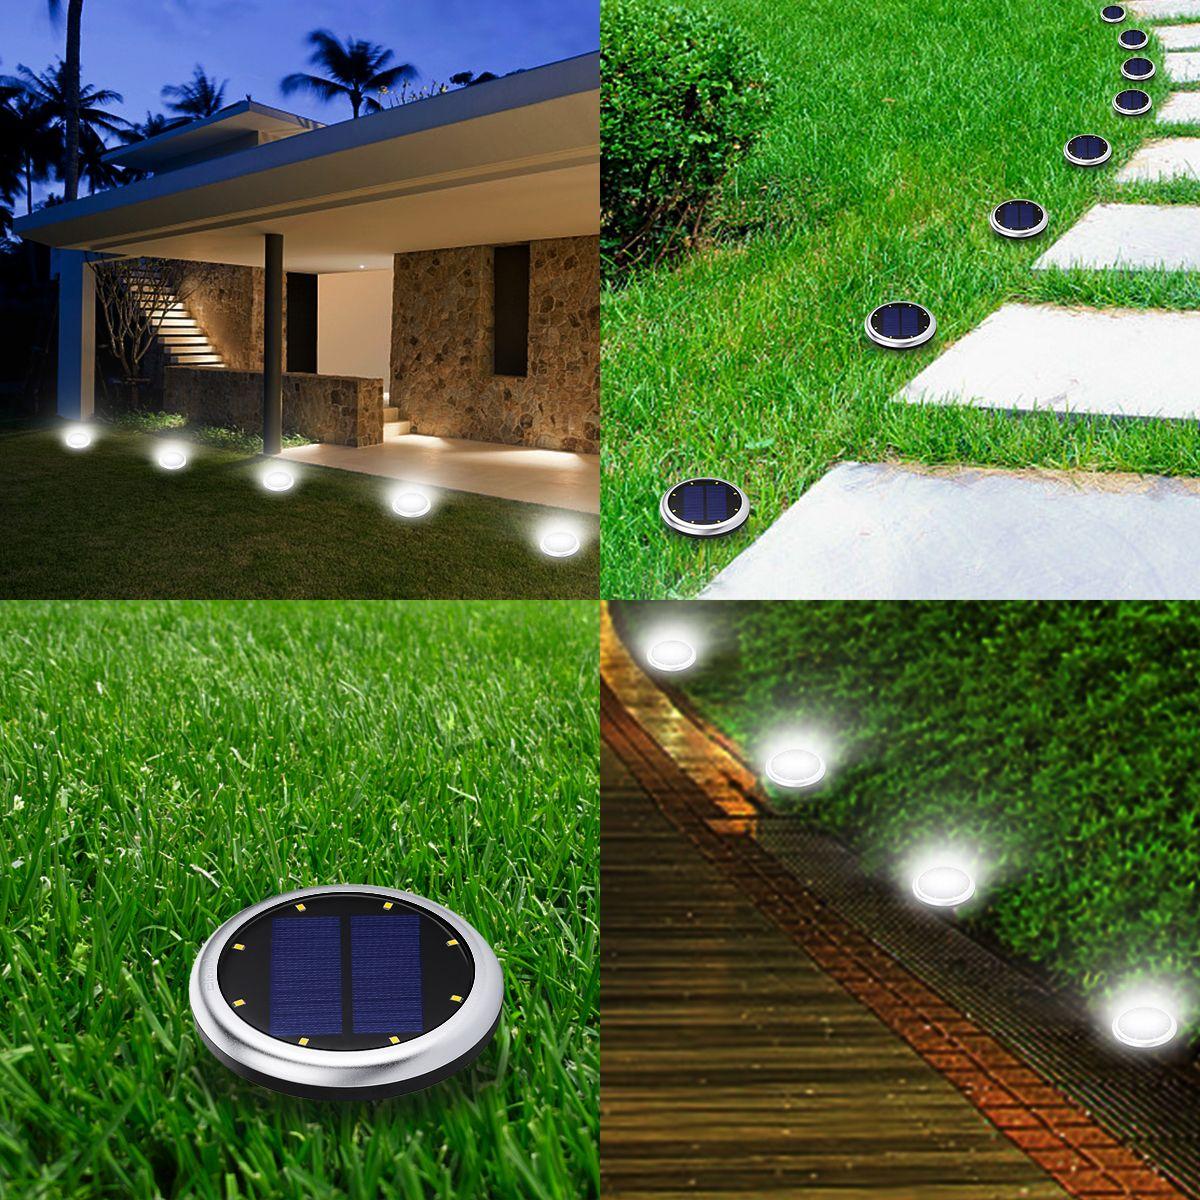 2Pcs LED Lamp Solar Powered Spot Light Outdoor Garden Lawn Landscape Waterproof